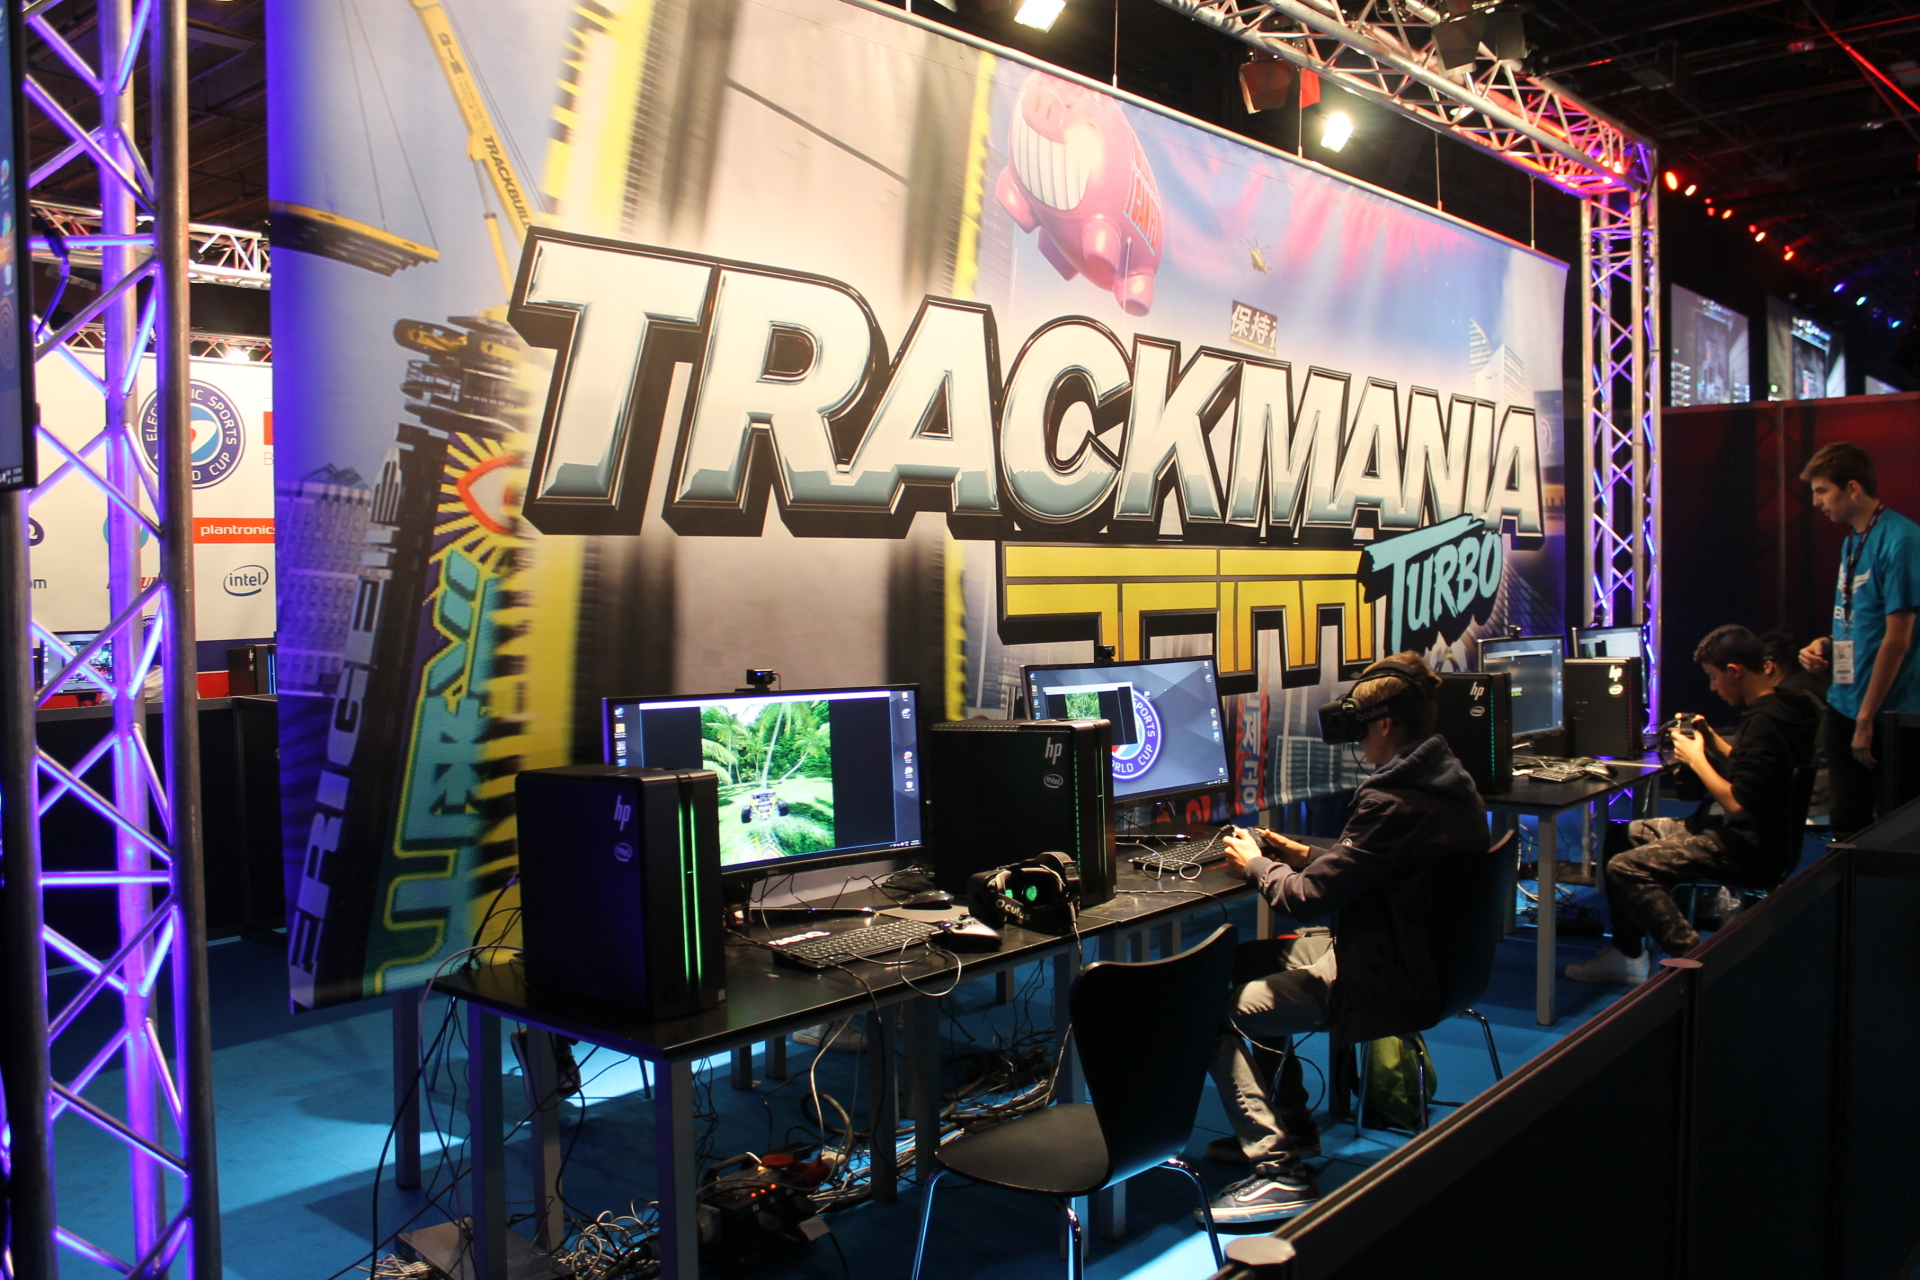 Trackmania Turbo Oculus RIft